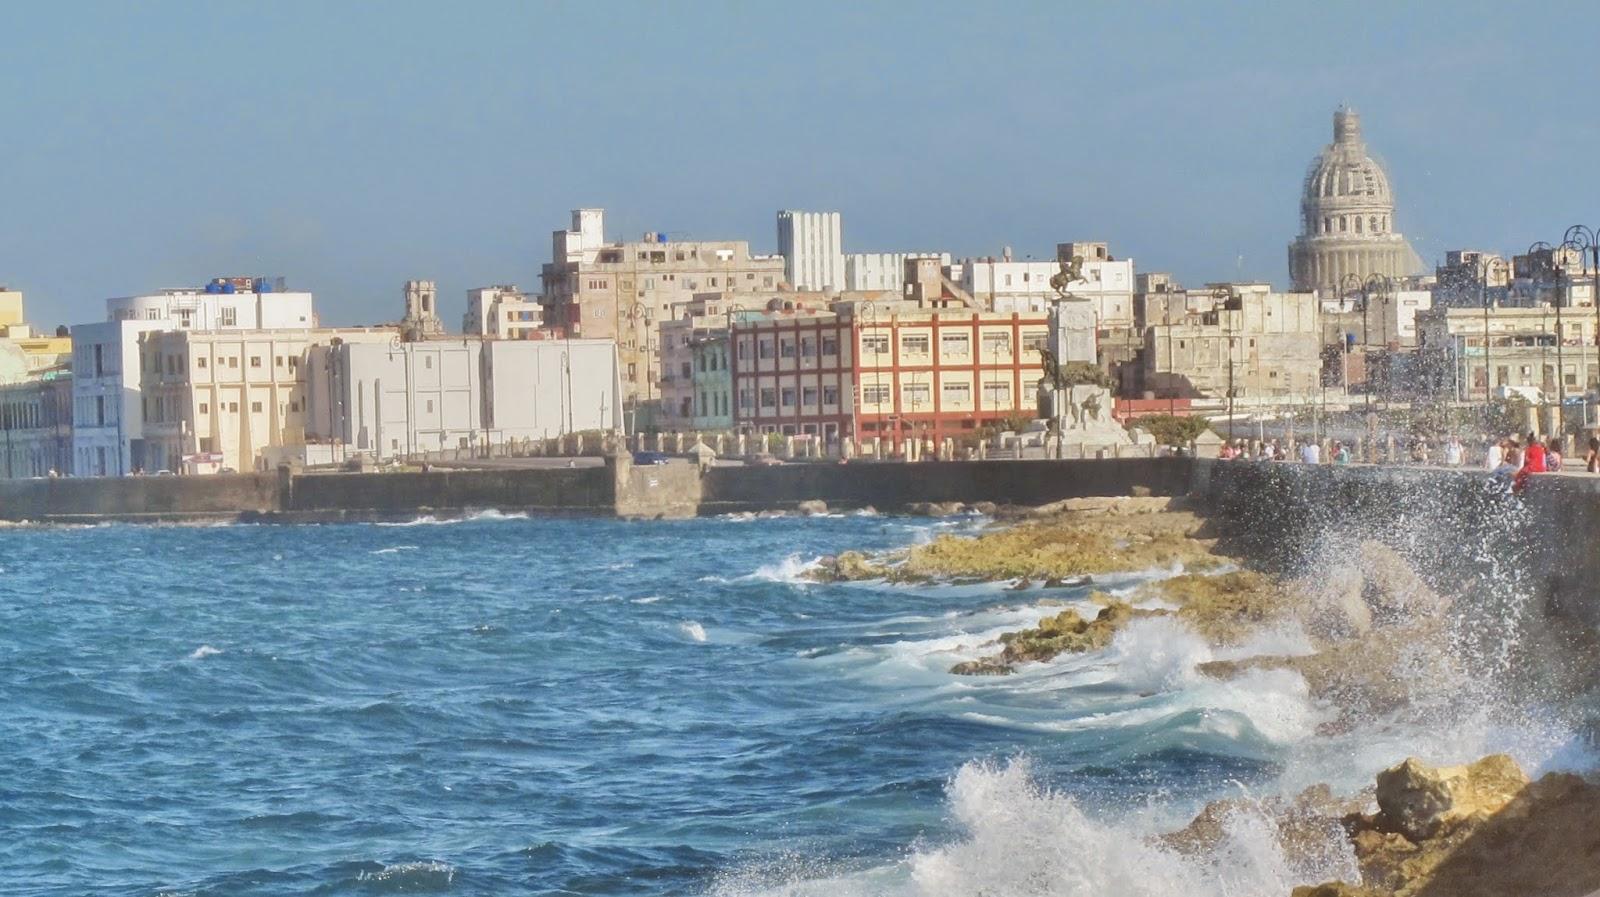 Malecón de Havana